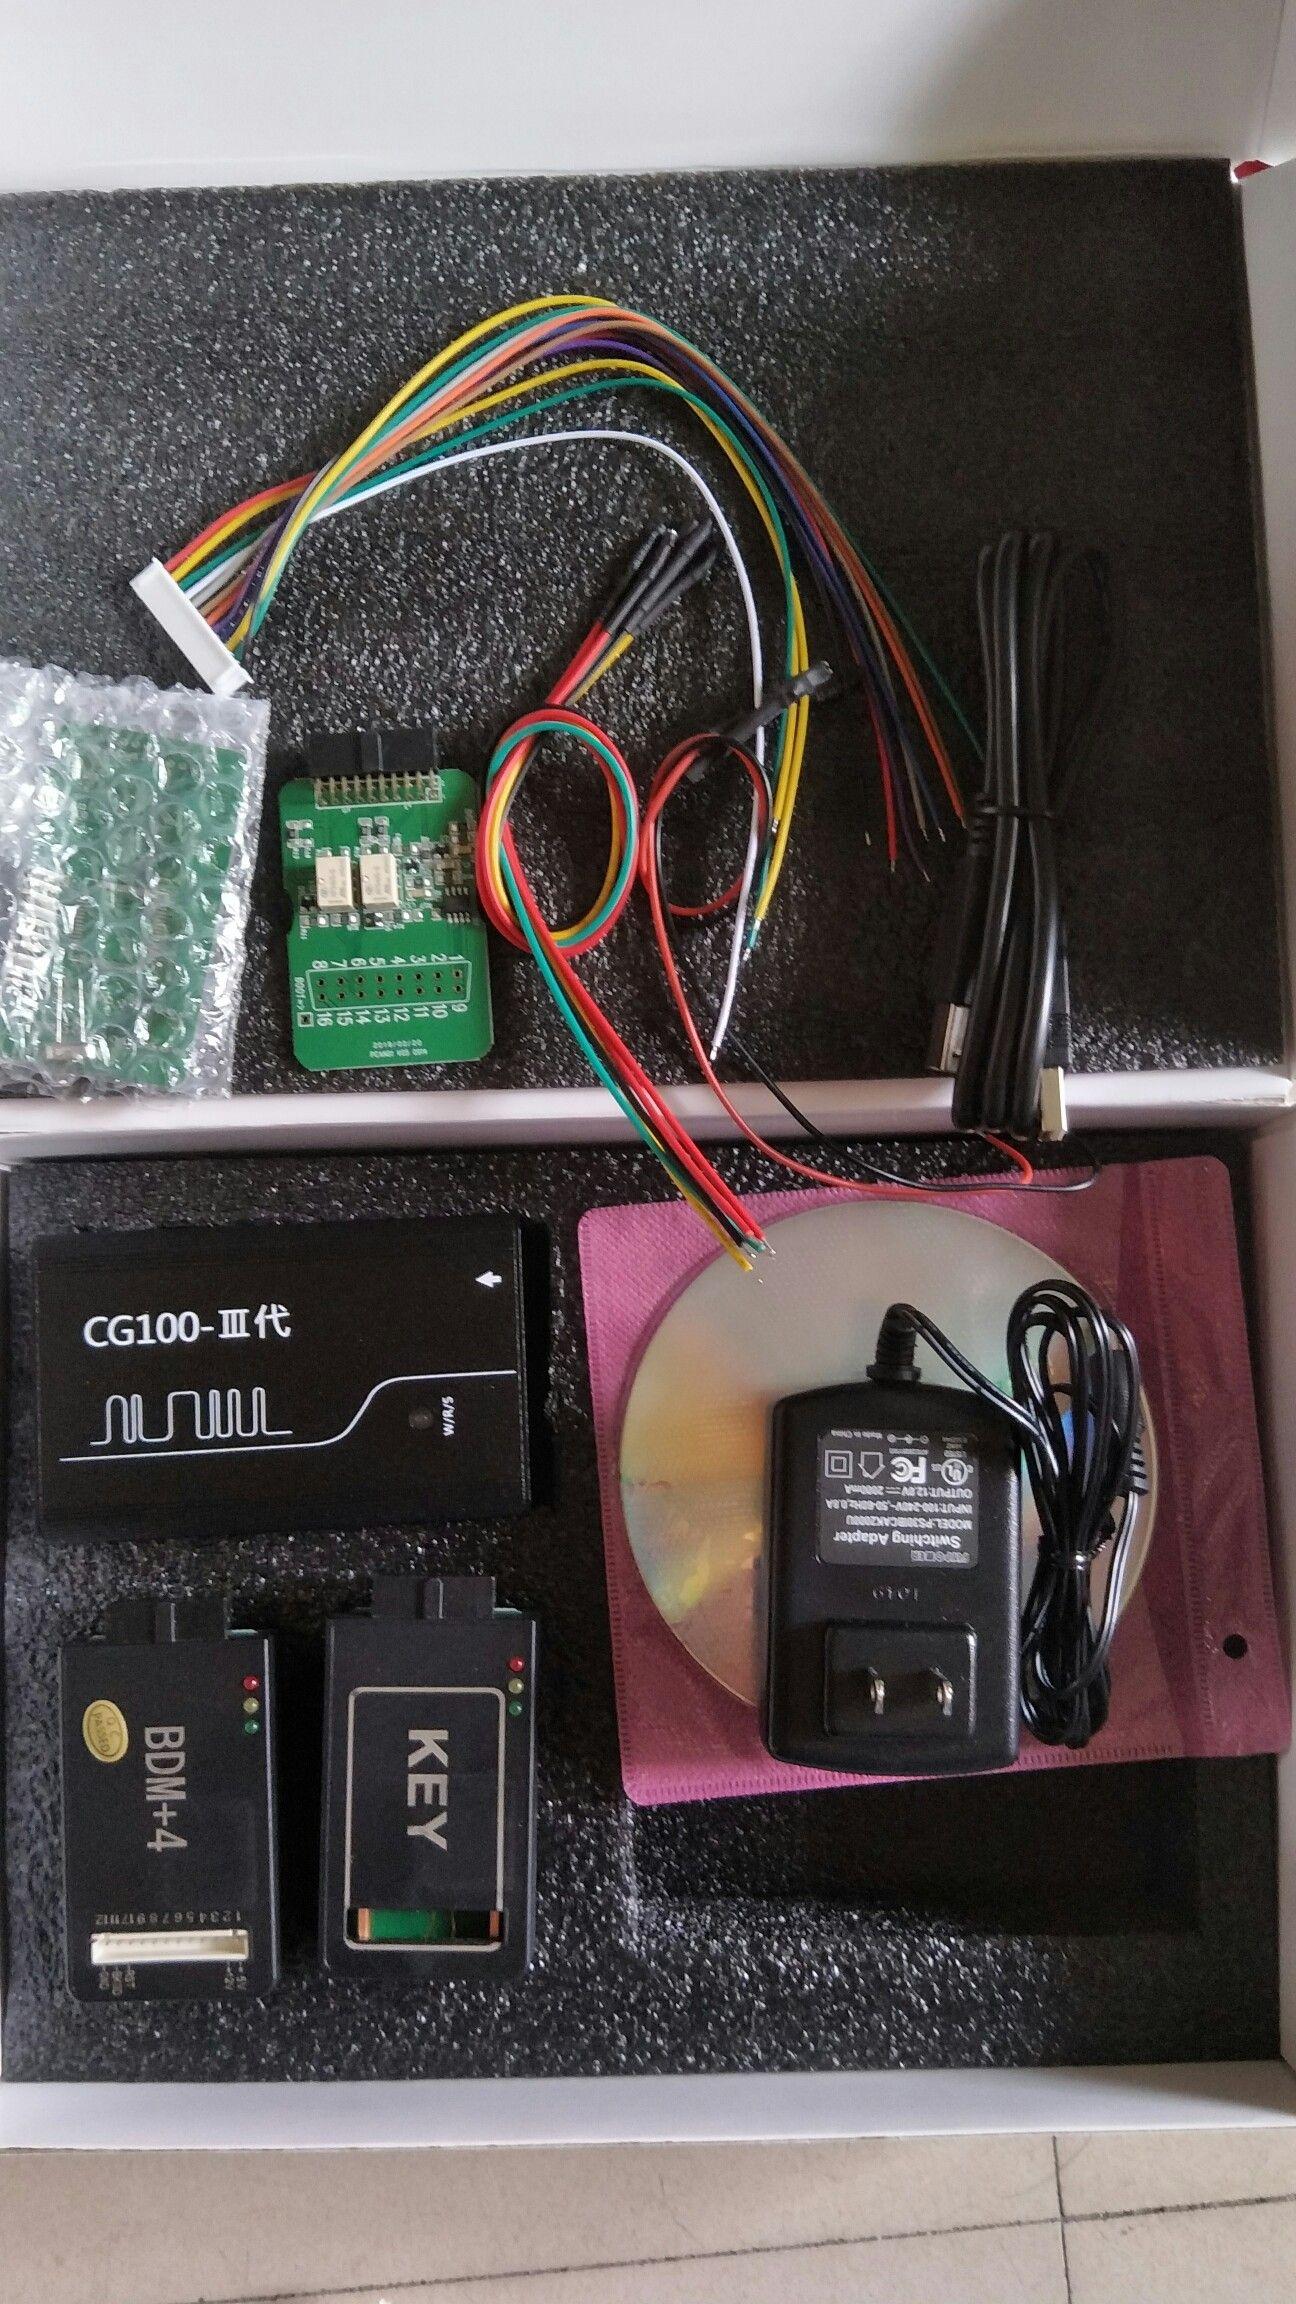 Cg100prog3 cg100 prog iii airbag restore devices cg100